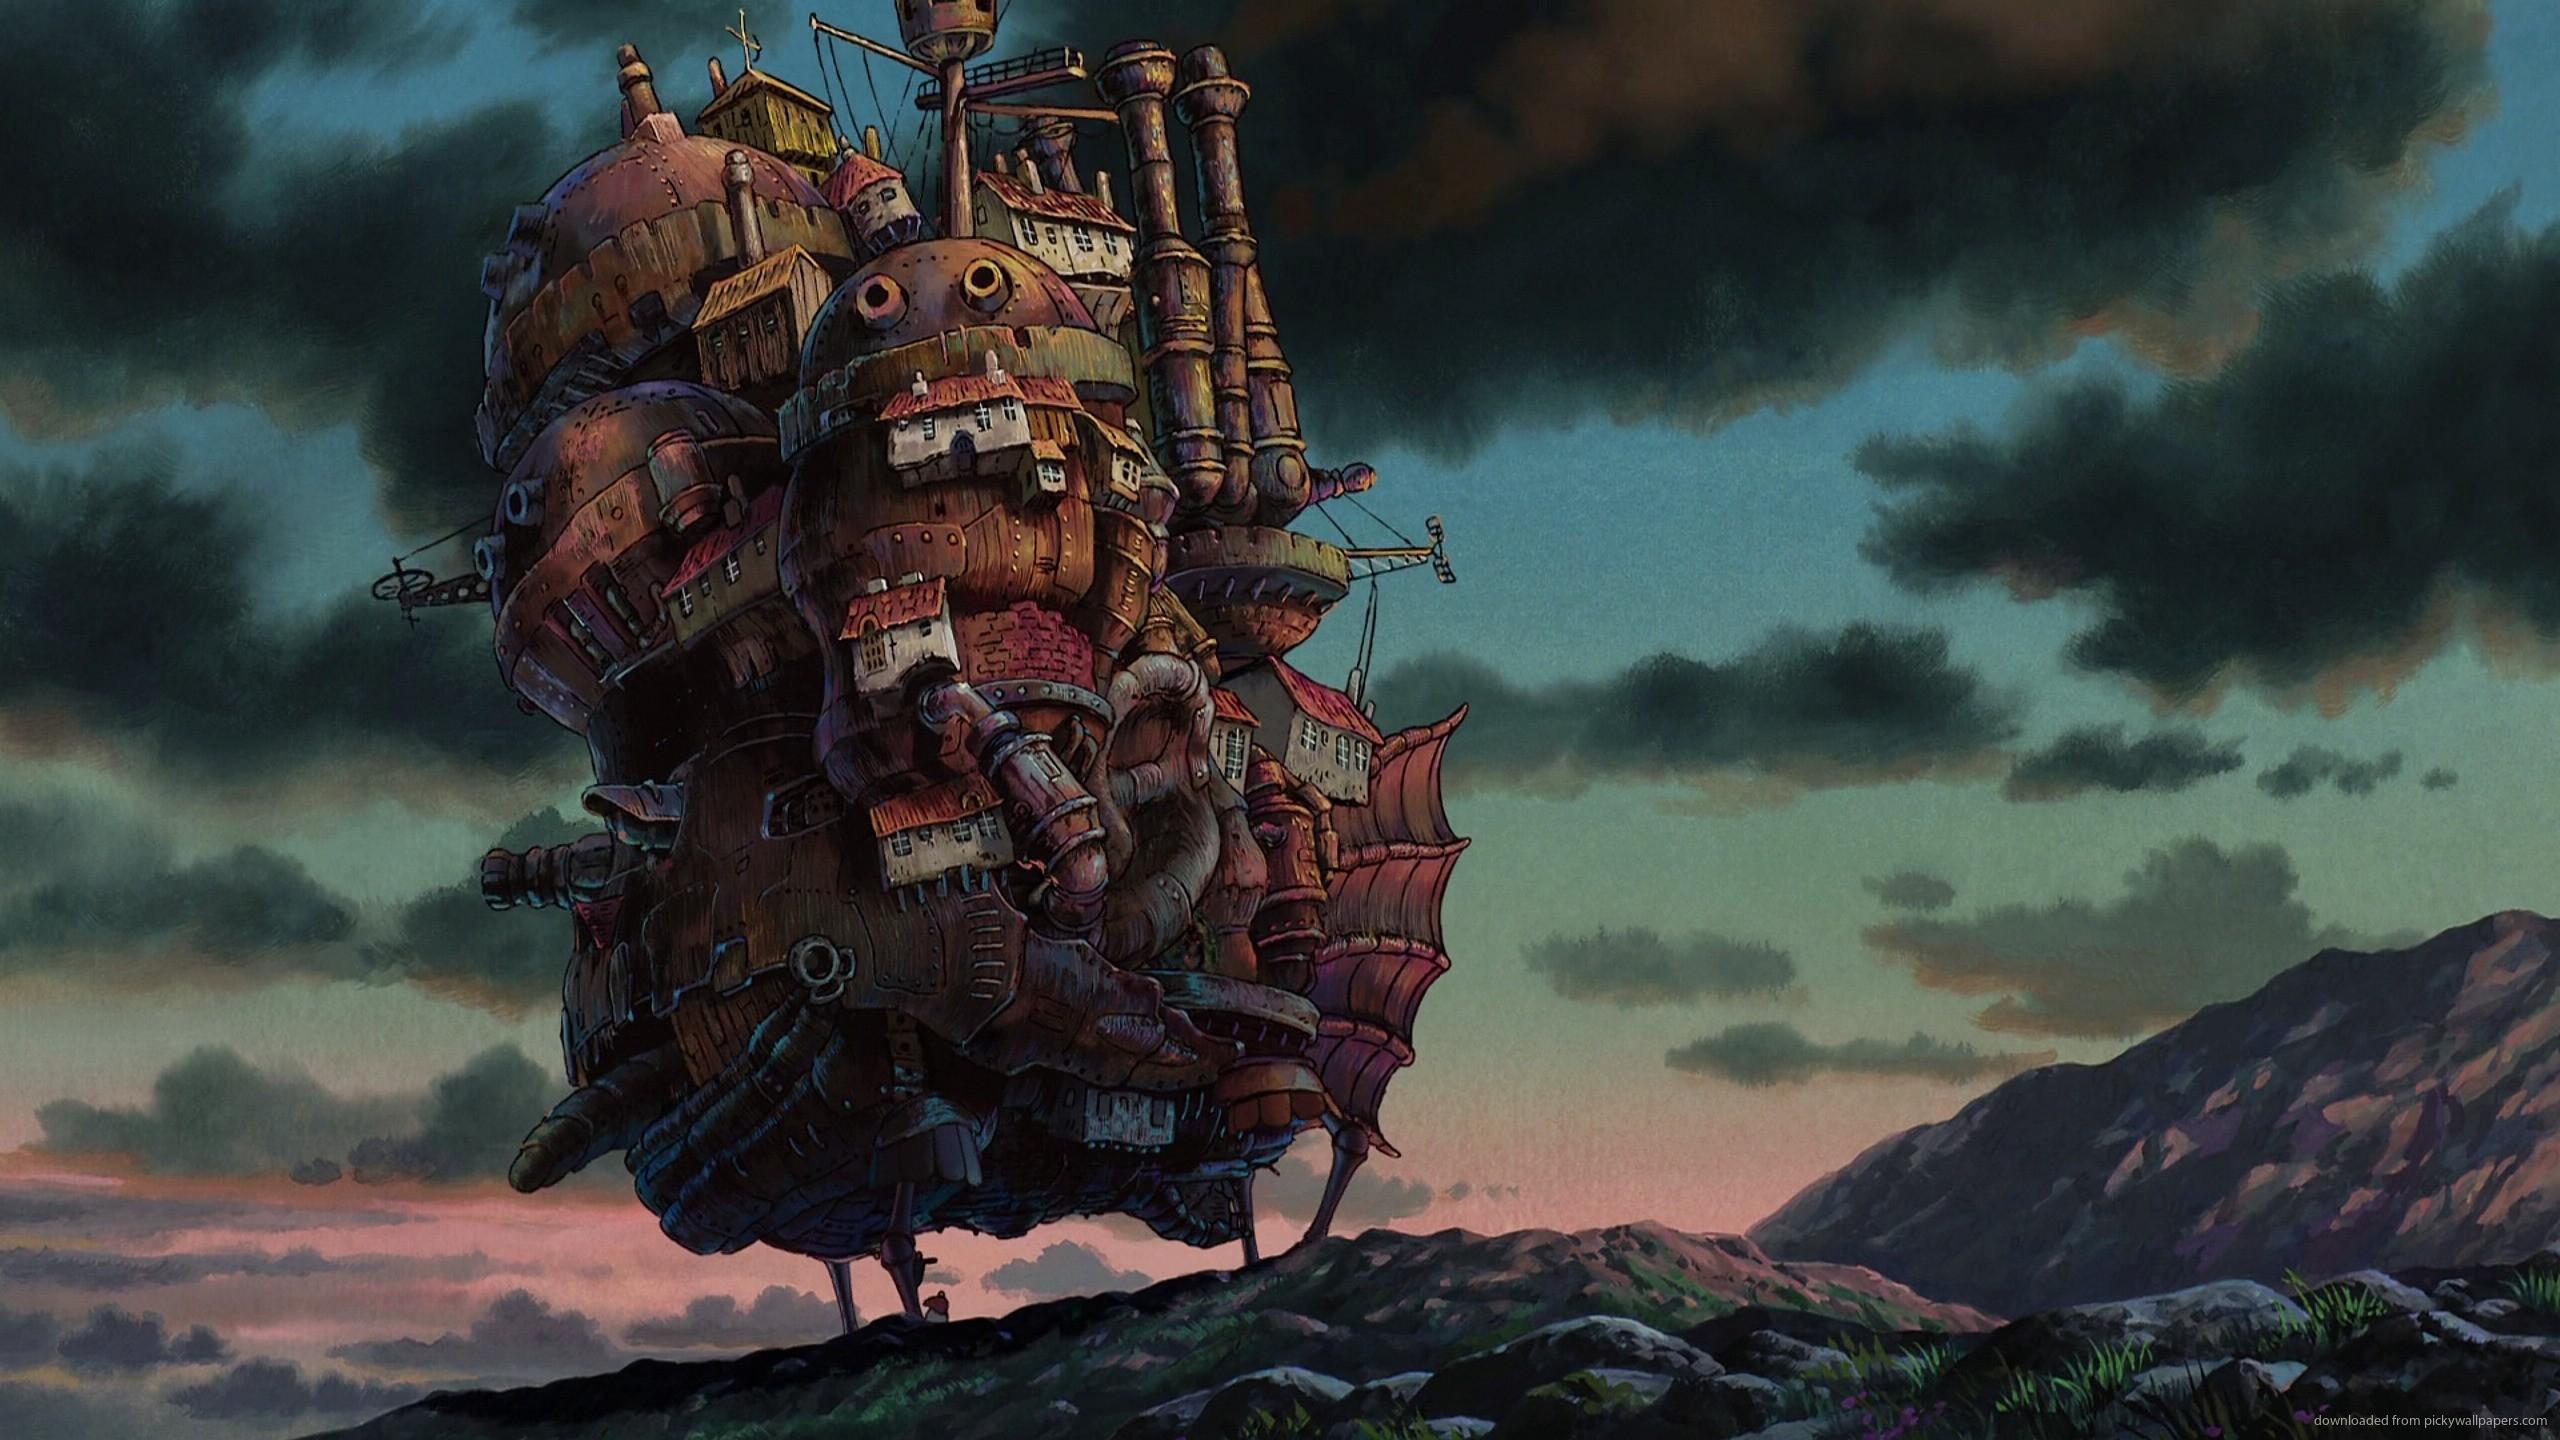 Pirate Ship Wallpaper High Quality Resolution Inside Battle Pirate · Not  Them MiyazakiStudiosHowl's Moving CastleAlbumWallpapersPirate …